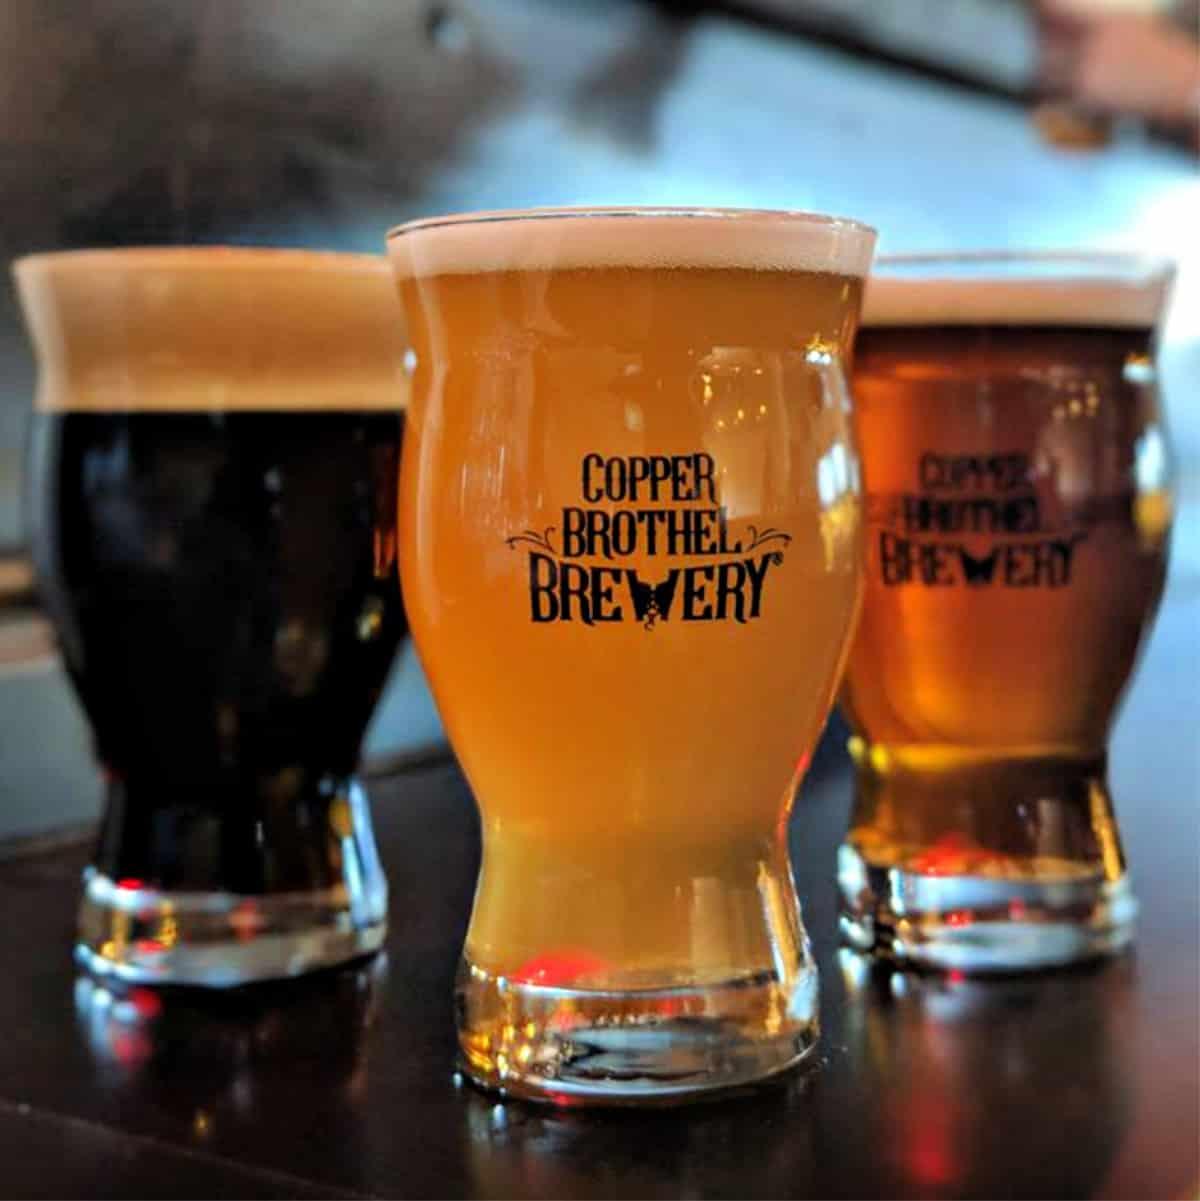 Copper Brothel glasses of beer